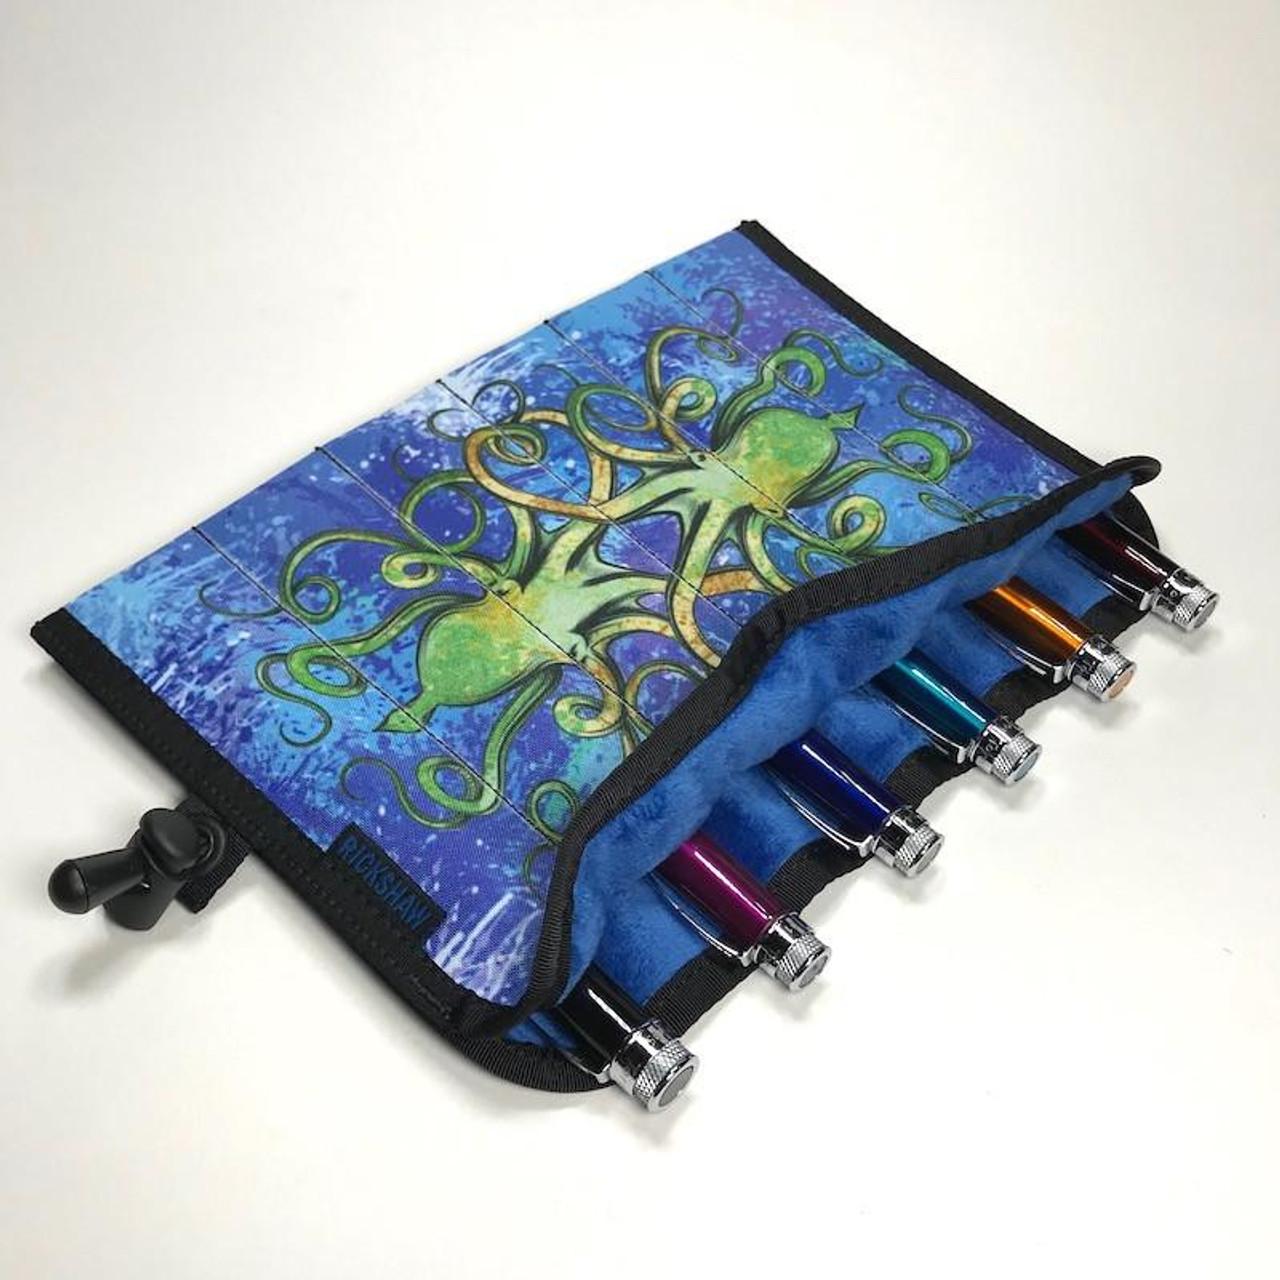 Inktopus, 6 Pen Hand Roll - Blue